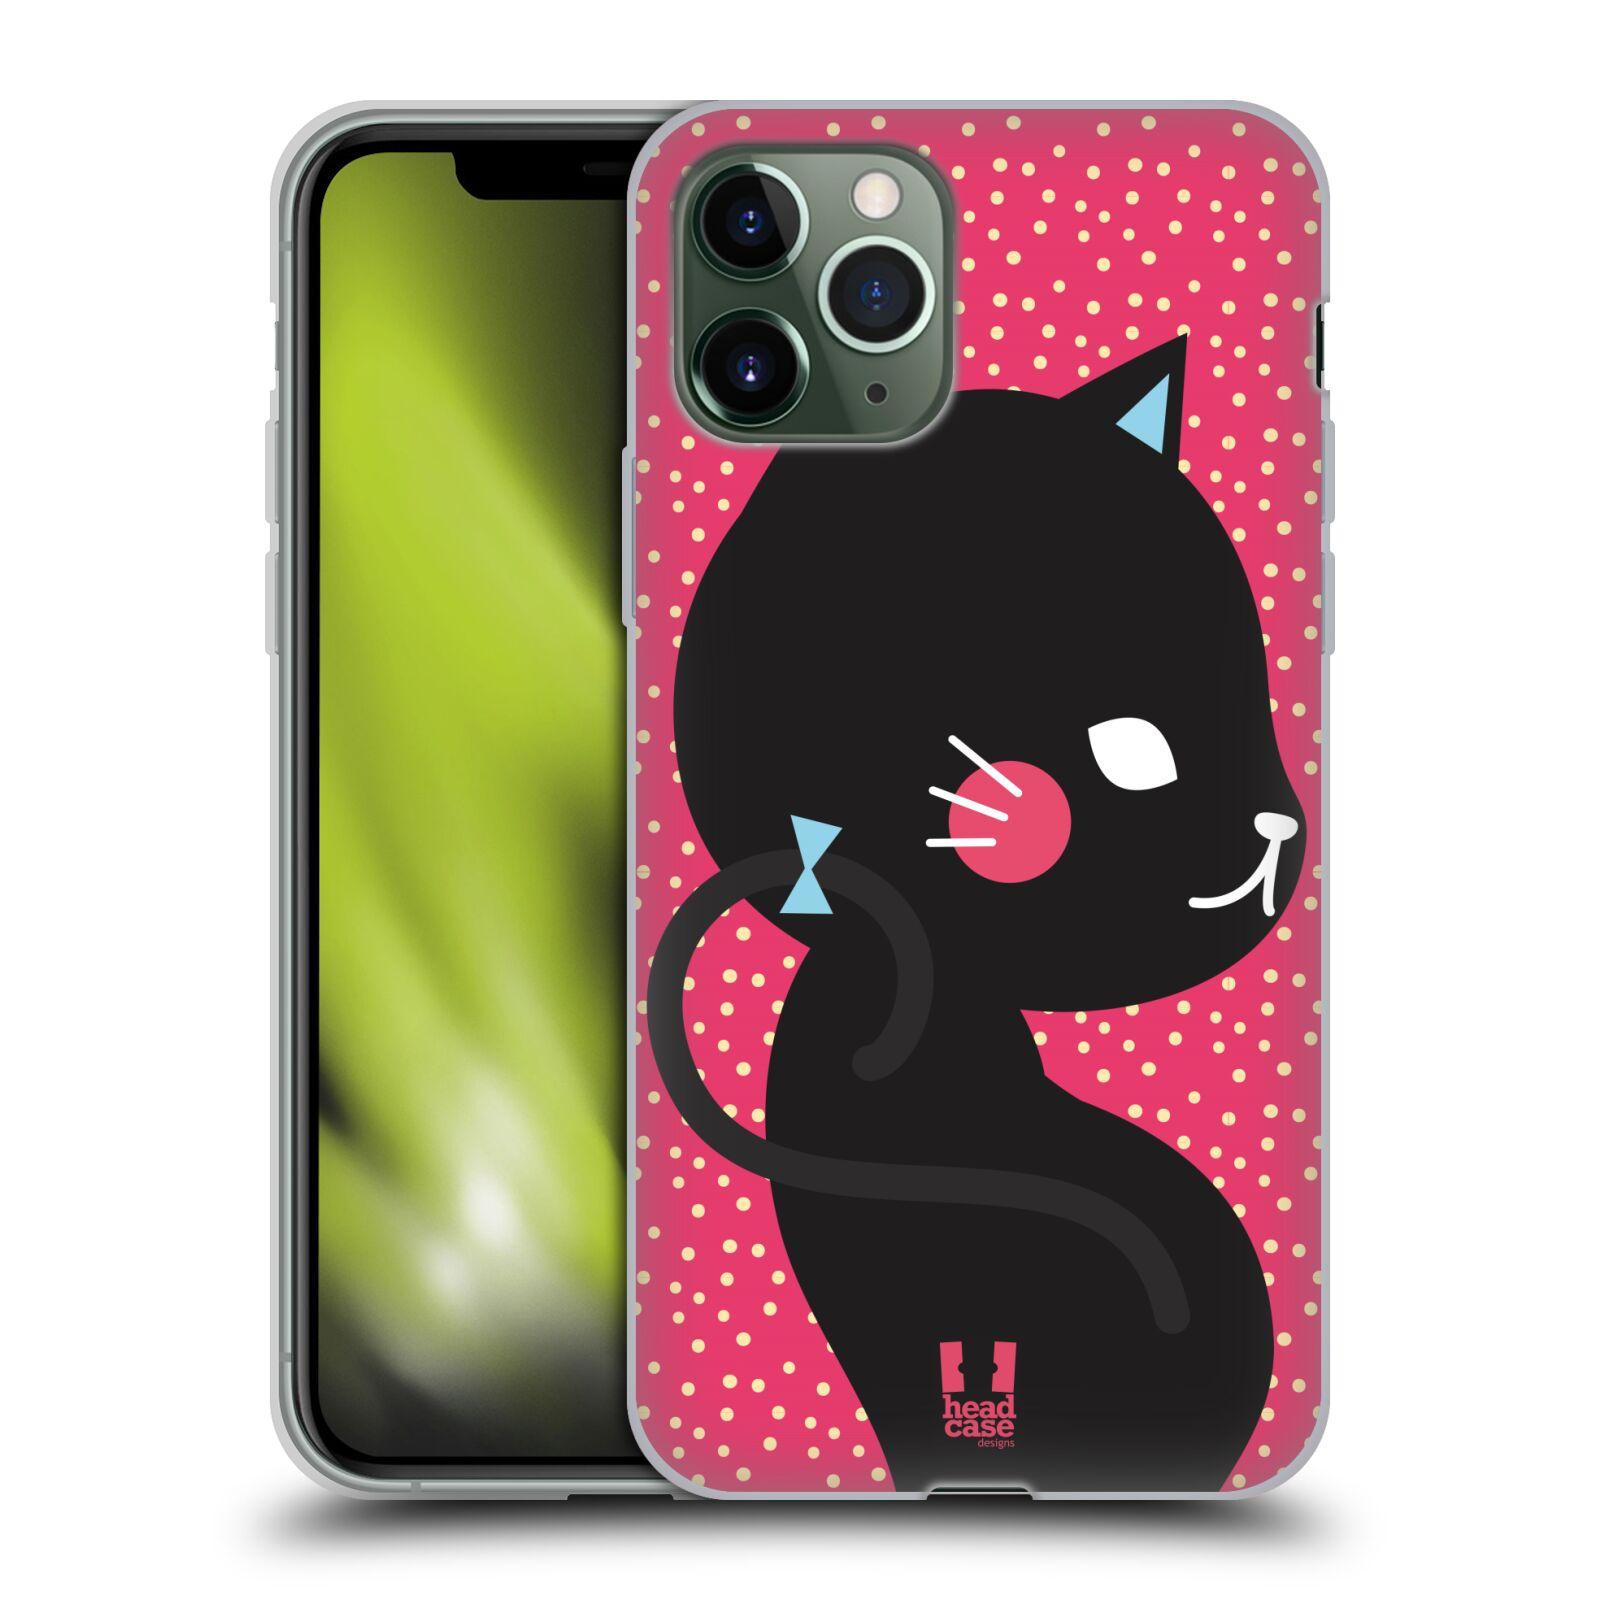 iphone 7 plus zadni kryty , Silikonové pouzdro na mobil Apple iPhone 11 Pro - Head Case - KOČIČKA Černá NA RŮŽOVÉ